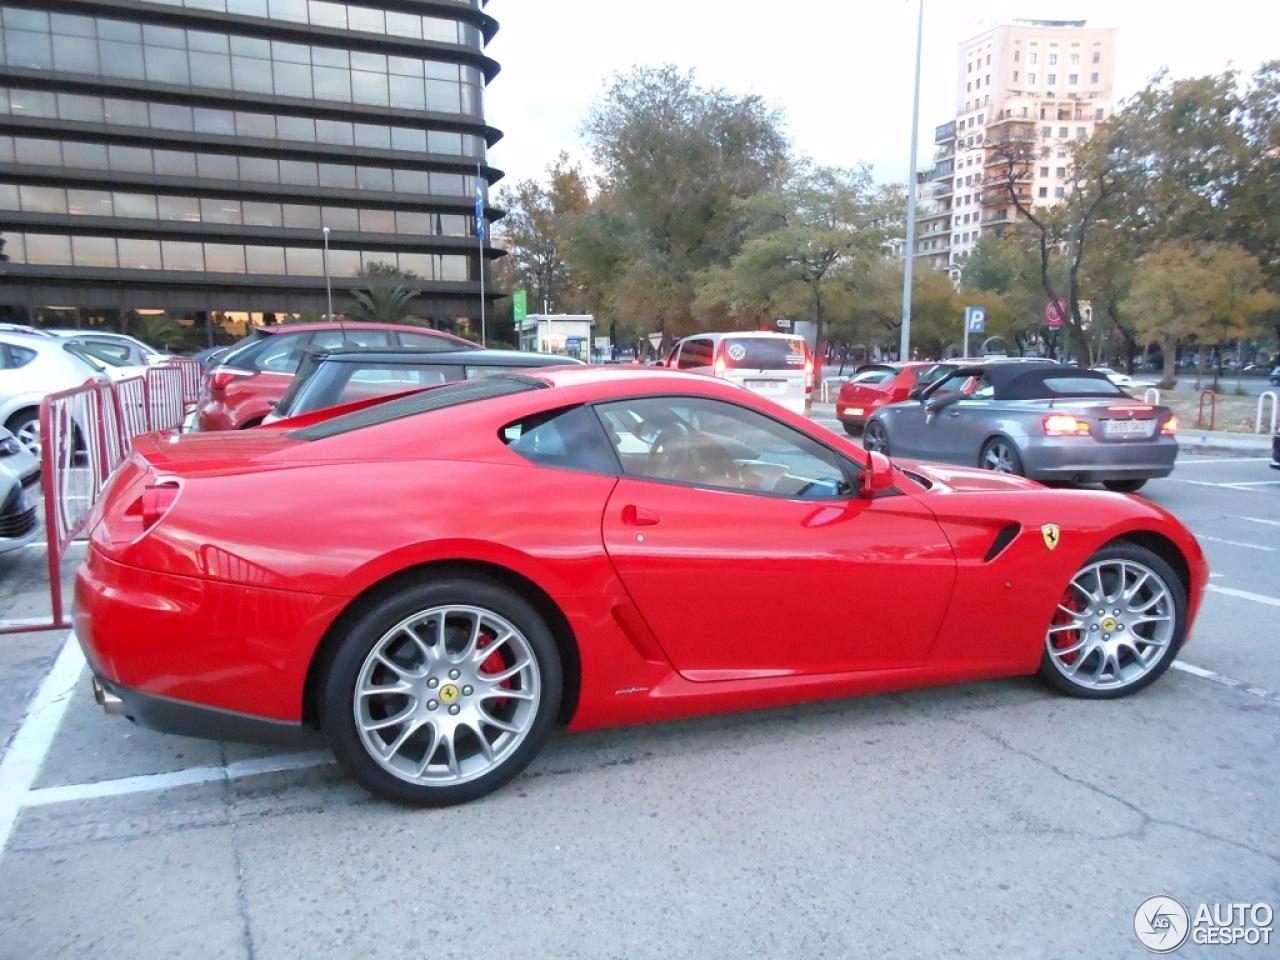 Ferrari 599 GTB Fiorano - 27 April 2014 - Autogespot